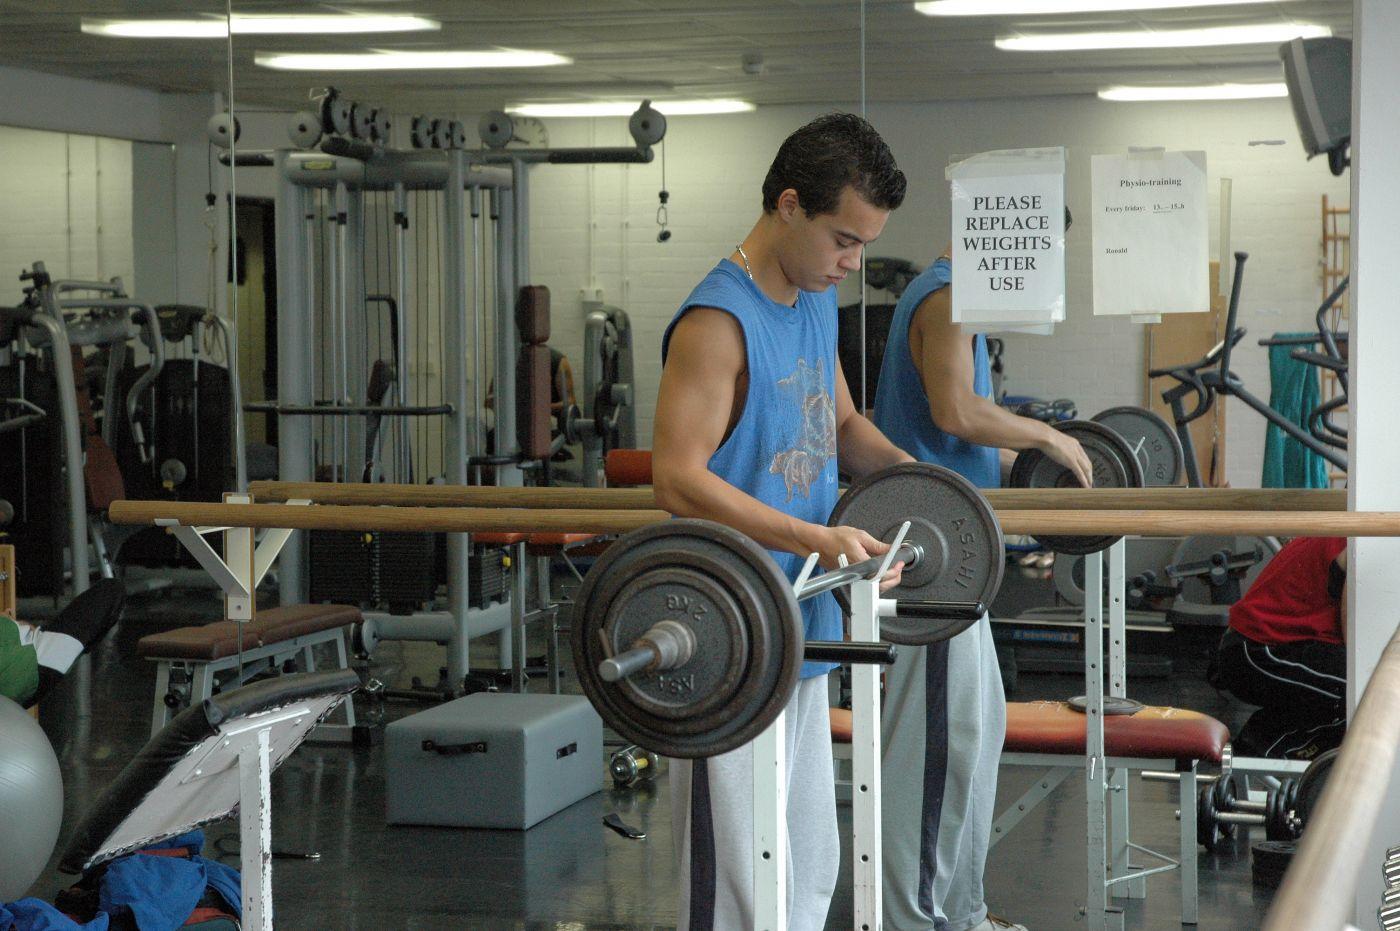 13.15-14.15 - tussen- uur fitness training